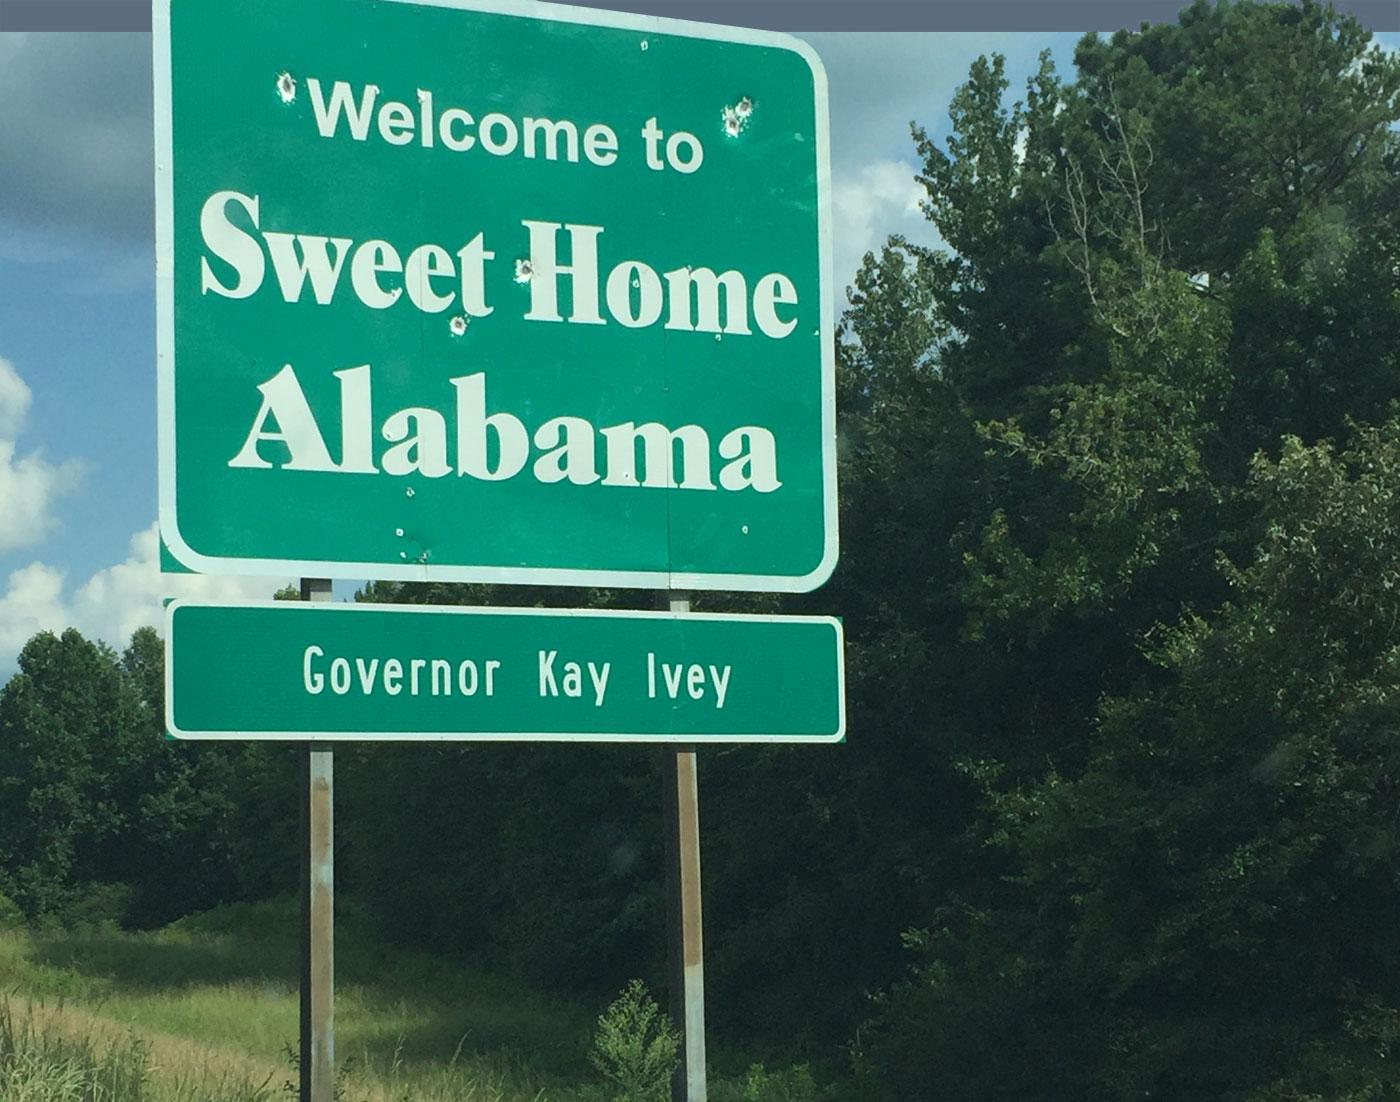 Podcast #065 - Sweet Home Alabama - The Radio Vagabond